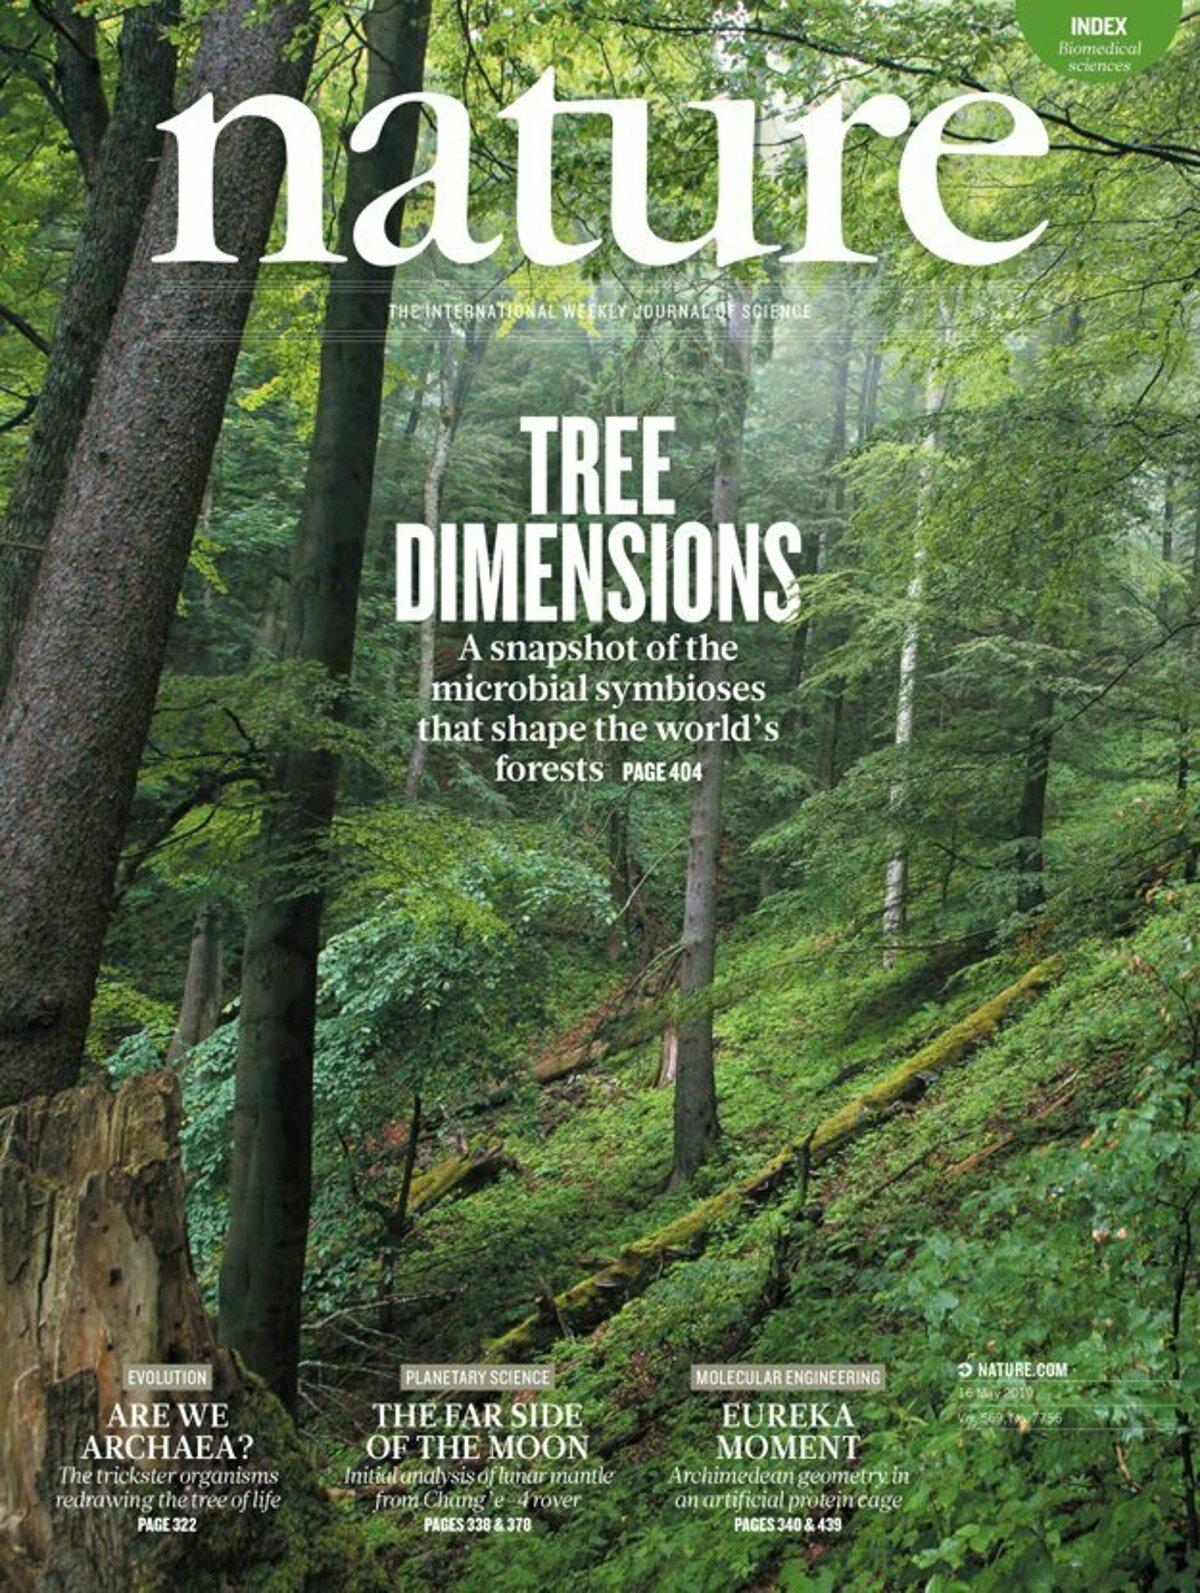 nature magazine cover forest magazines sk science slovak sme smedata prestigious primaeval subscription spectator subscribe newsstand british ondrej source